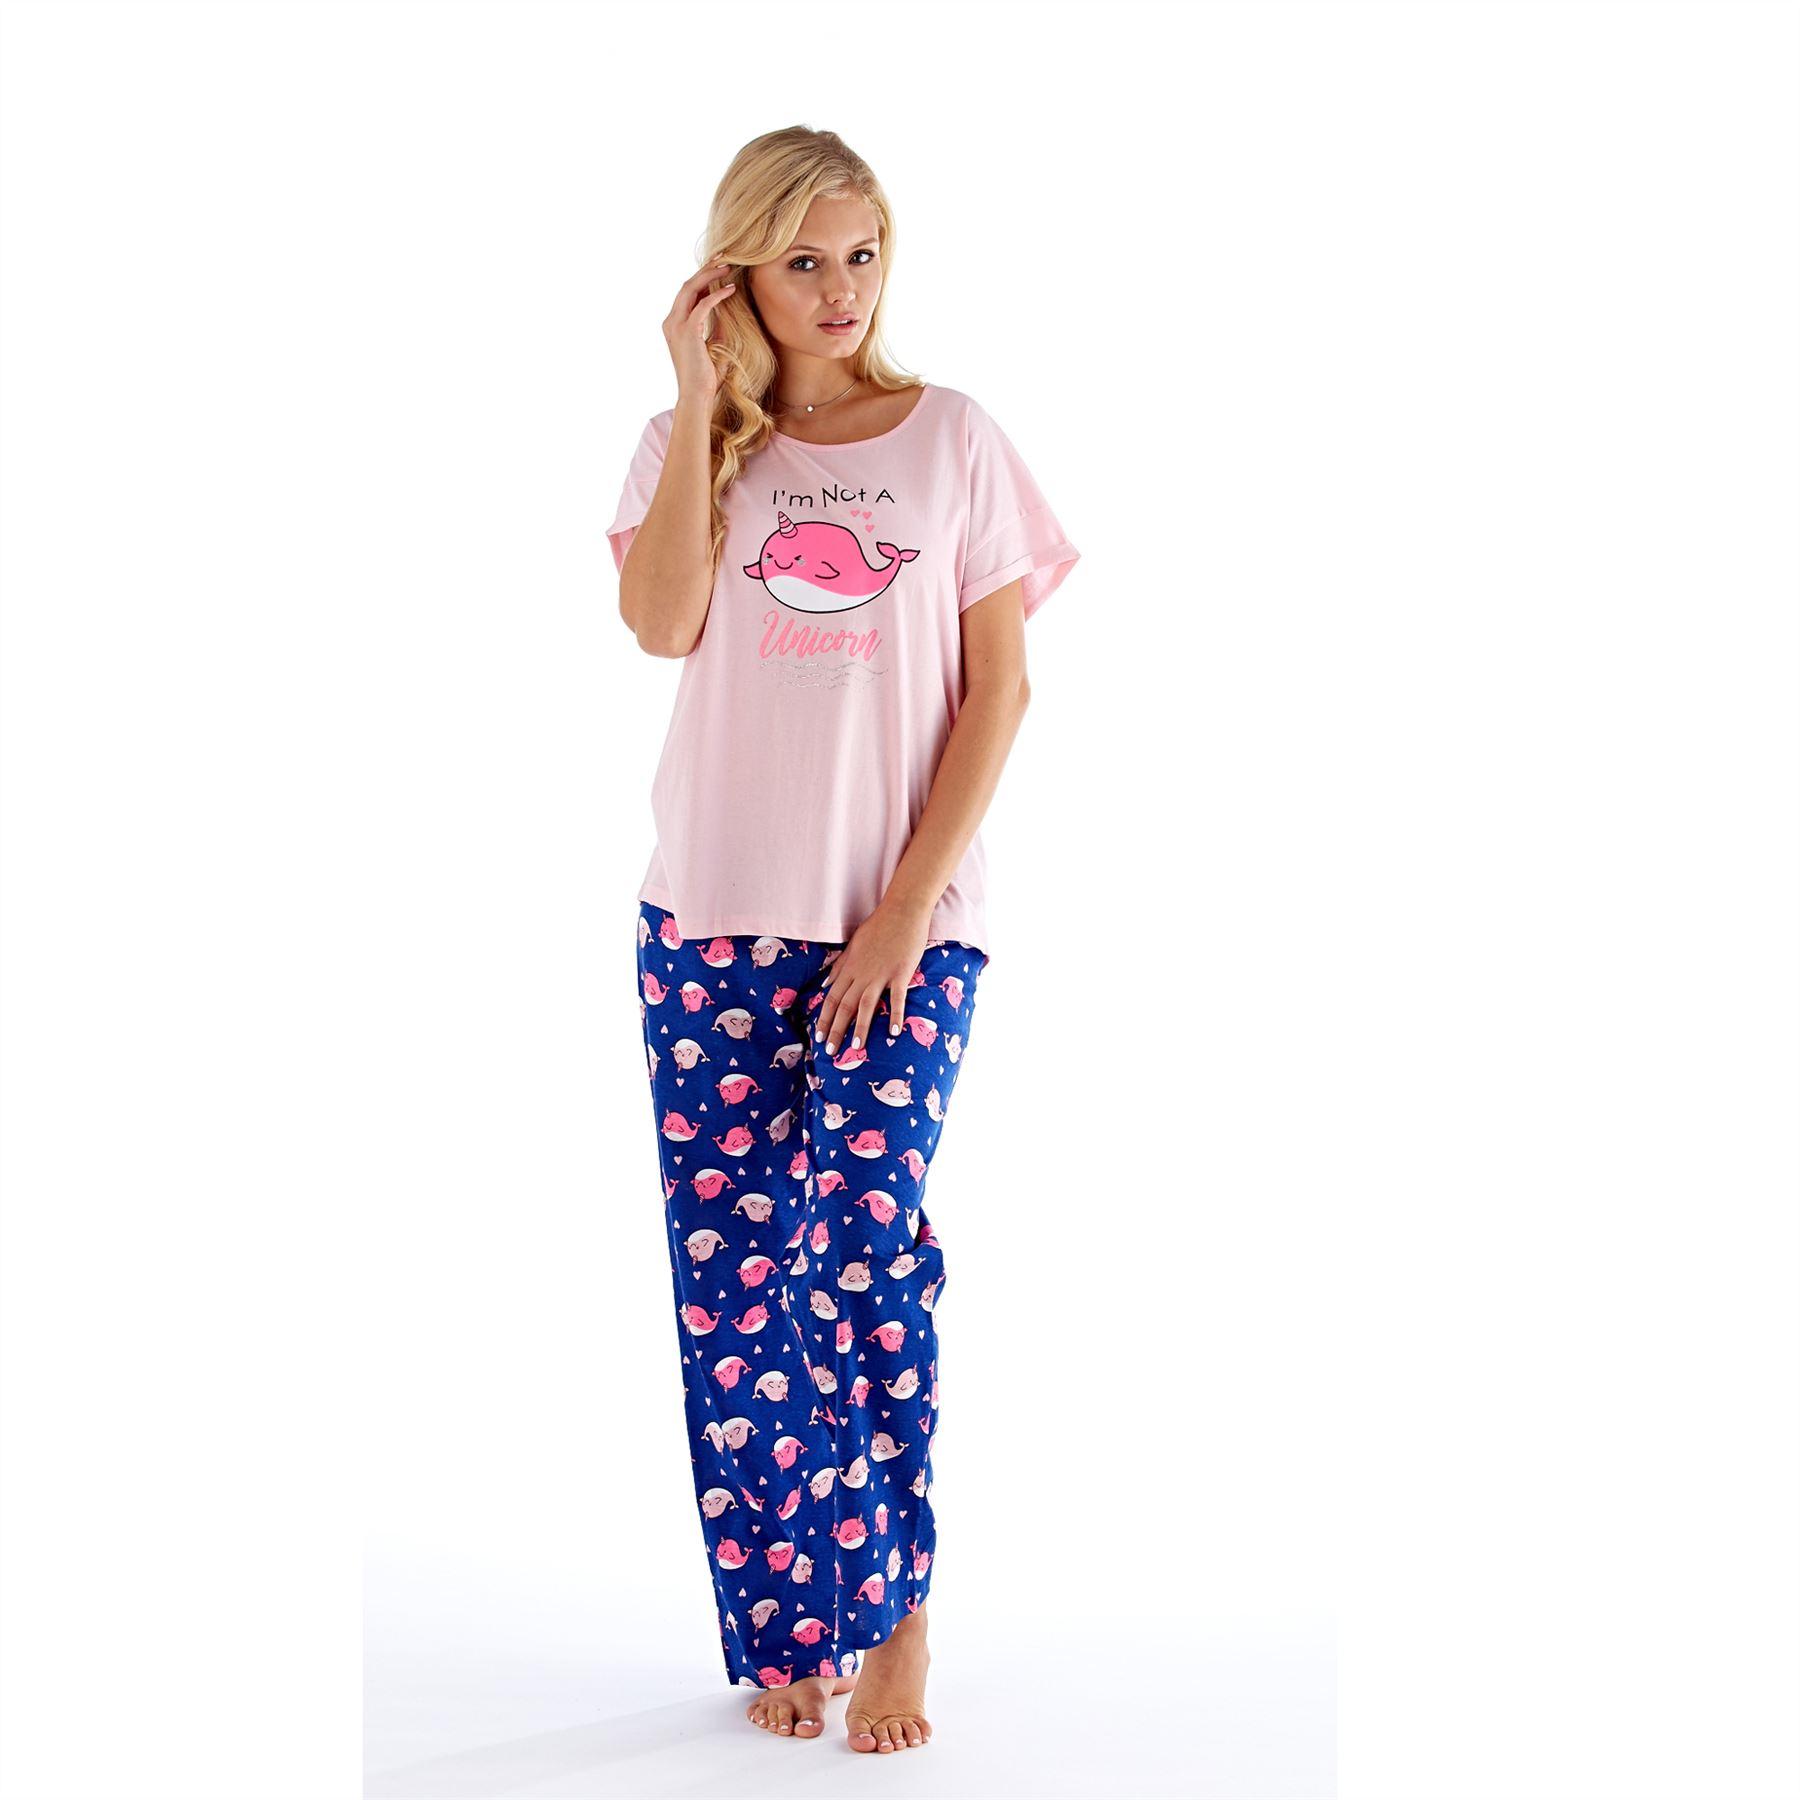 Womens-Ladies-Cotton-Pyjamas-Pyjama-PJs-Summer-Nightwear-Set-Size-8-18-NEW thumbnail 25